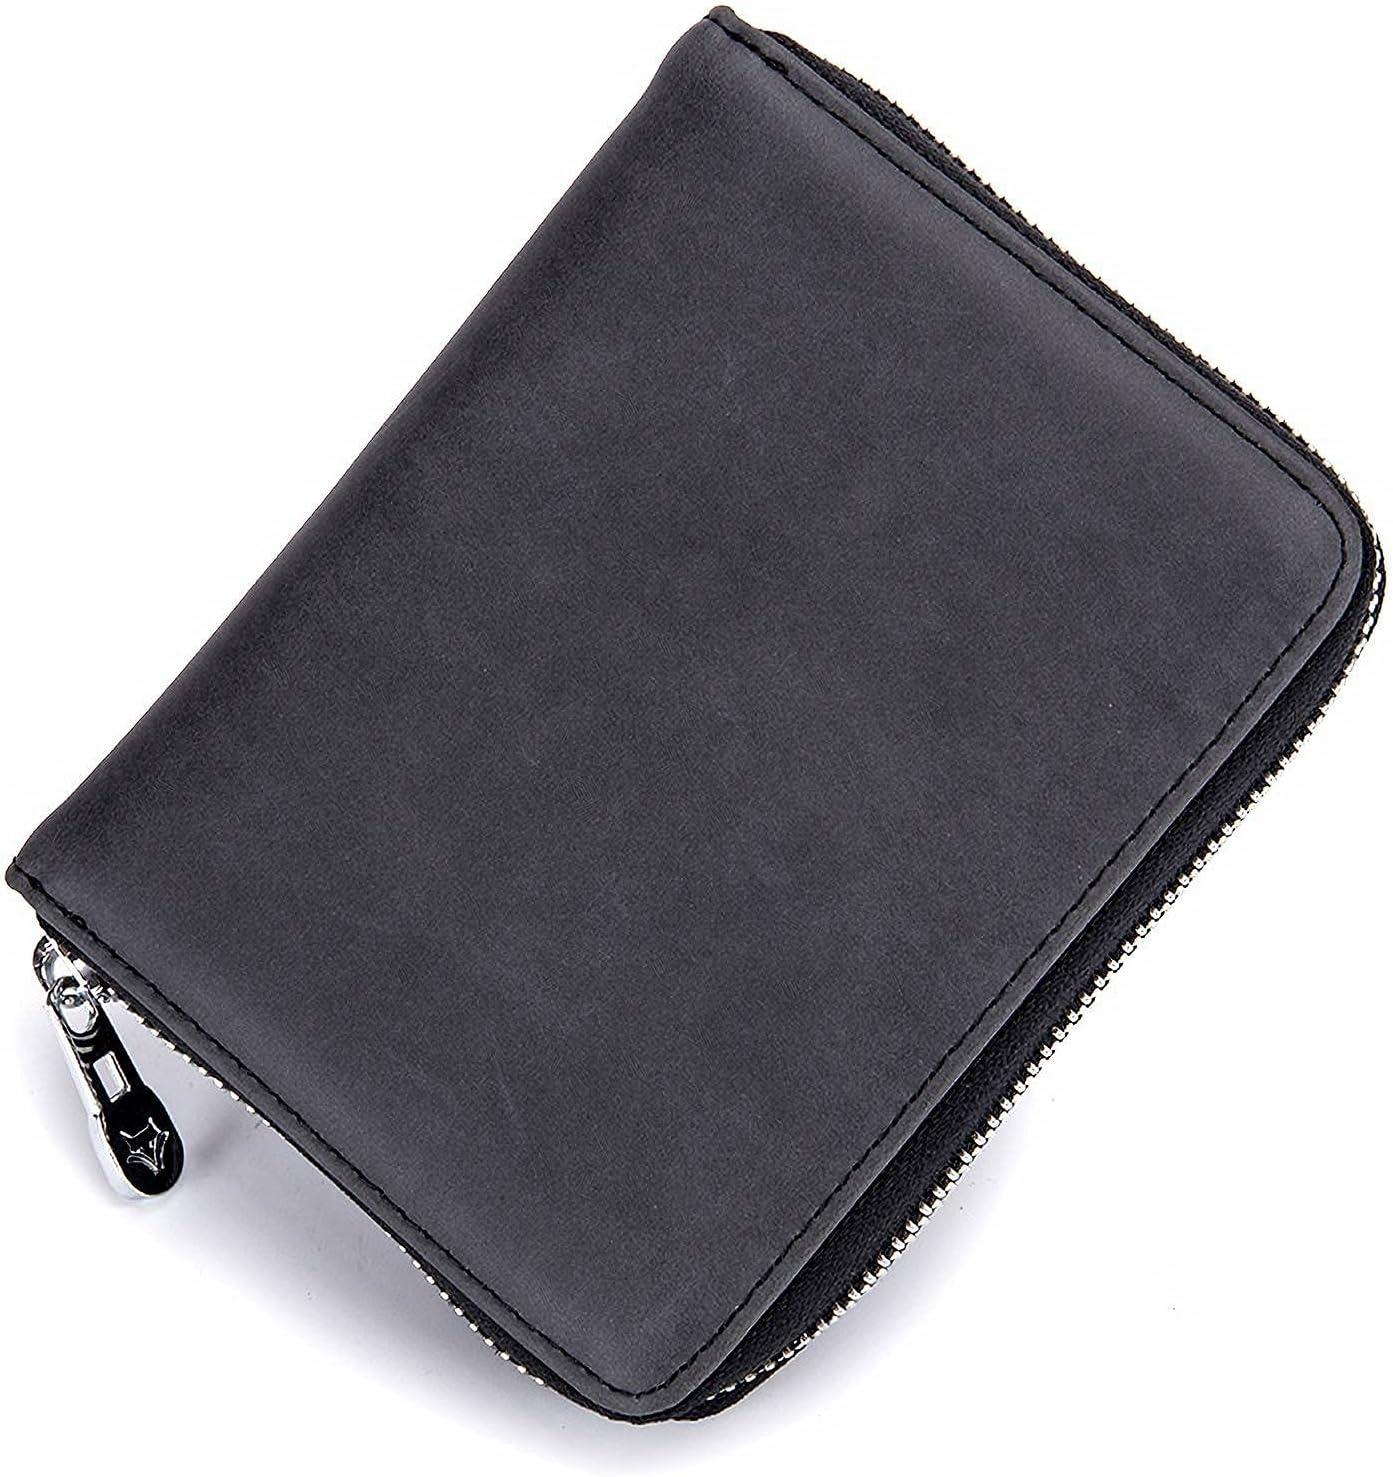 Tesucotus Credit Card Holder Wallet Leather RFID Blocking Wallet for Women Men (Black)